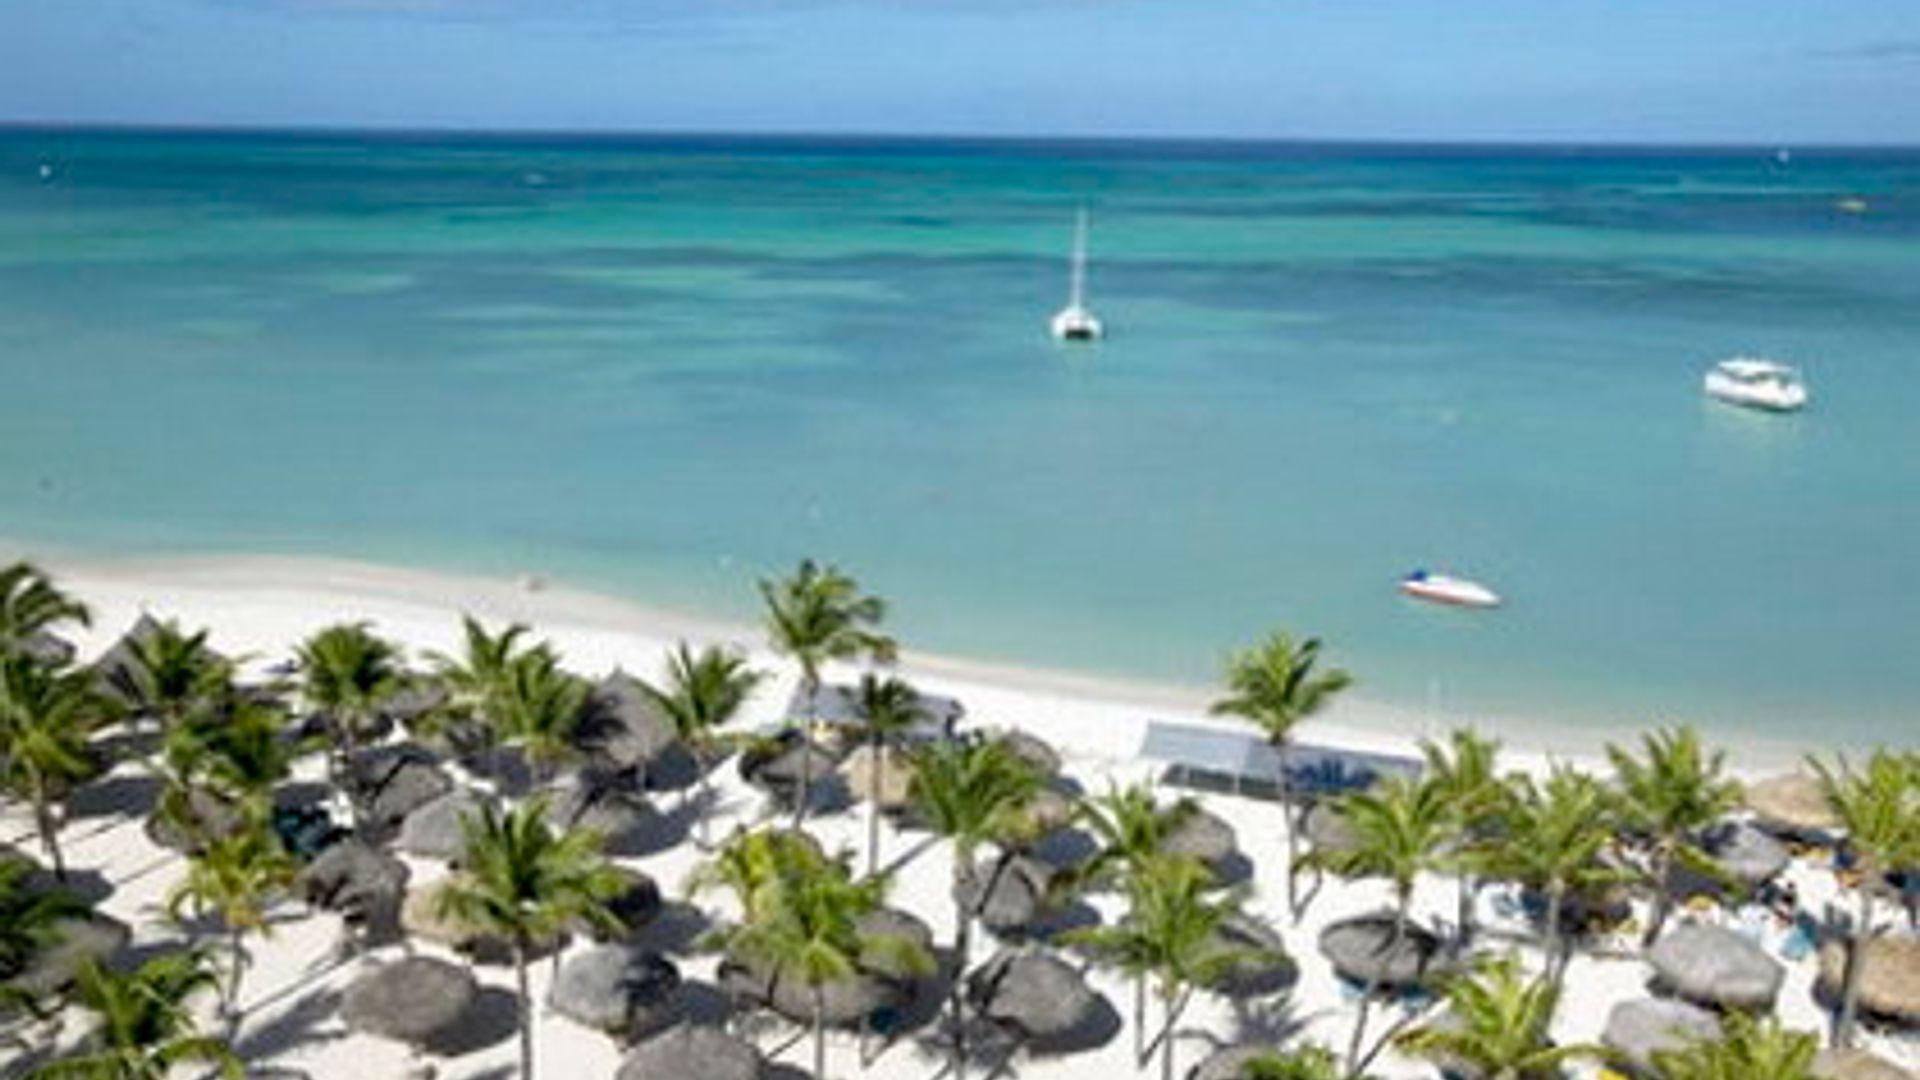 Revelion 2022 - Sejur Amsterdam si plaja Aruba, 12 zile